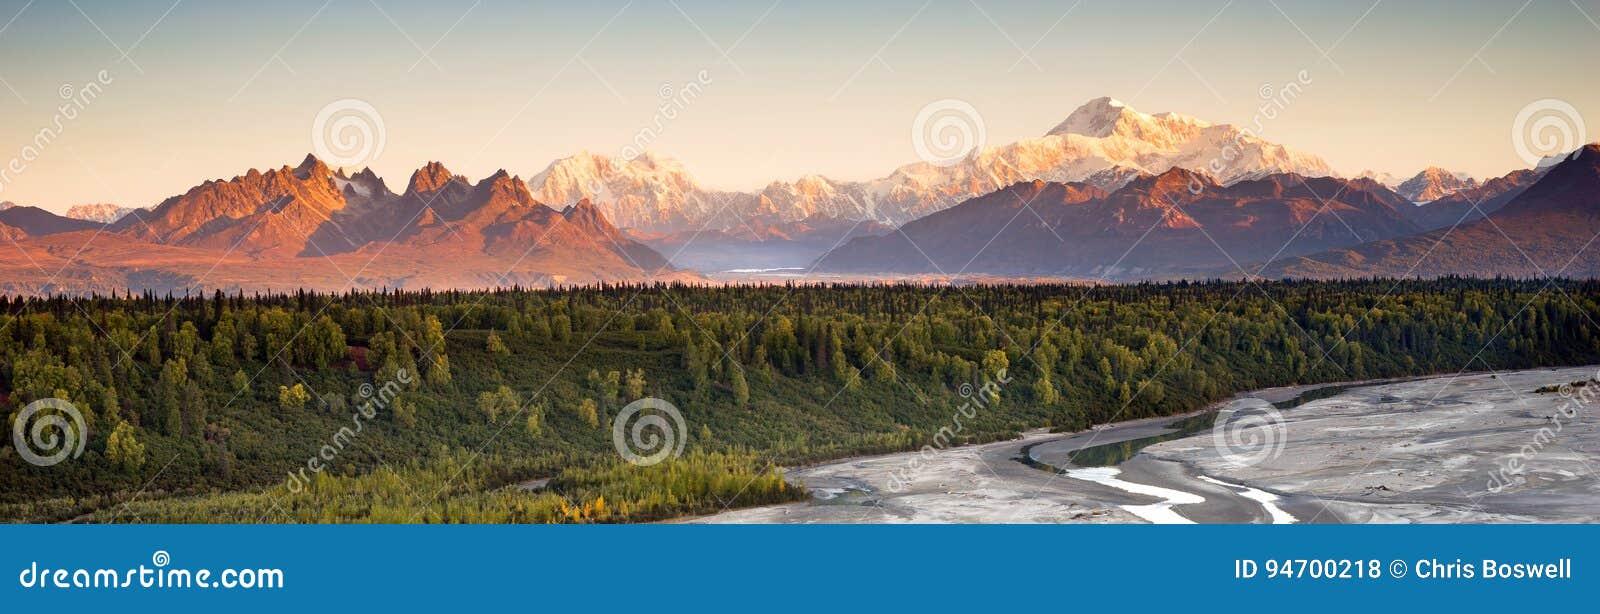 Denali范围Mt麦金莱阿拉斯加北美